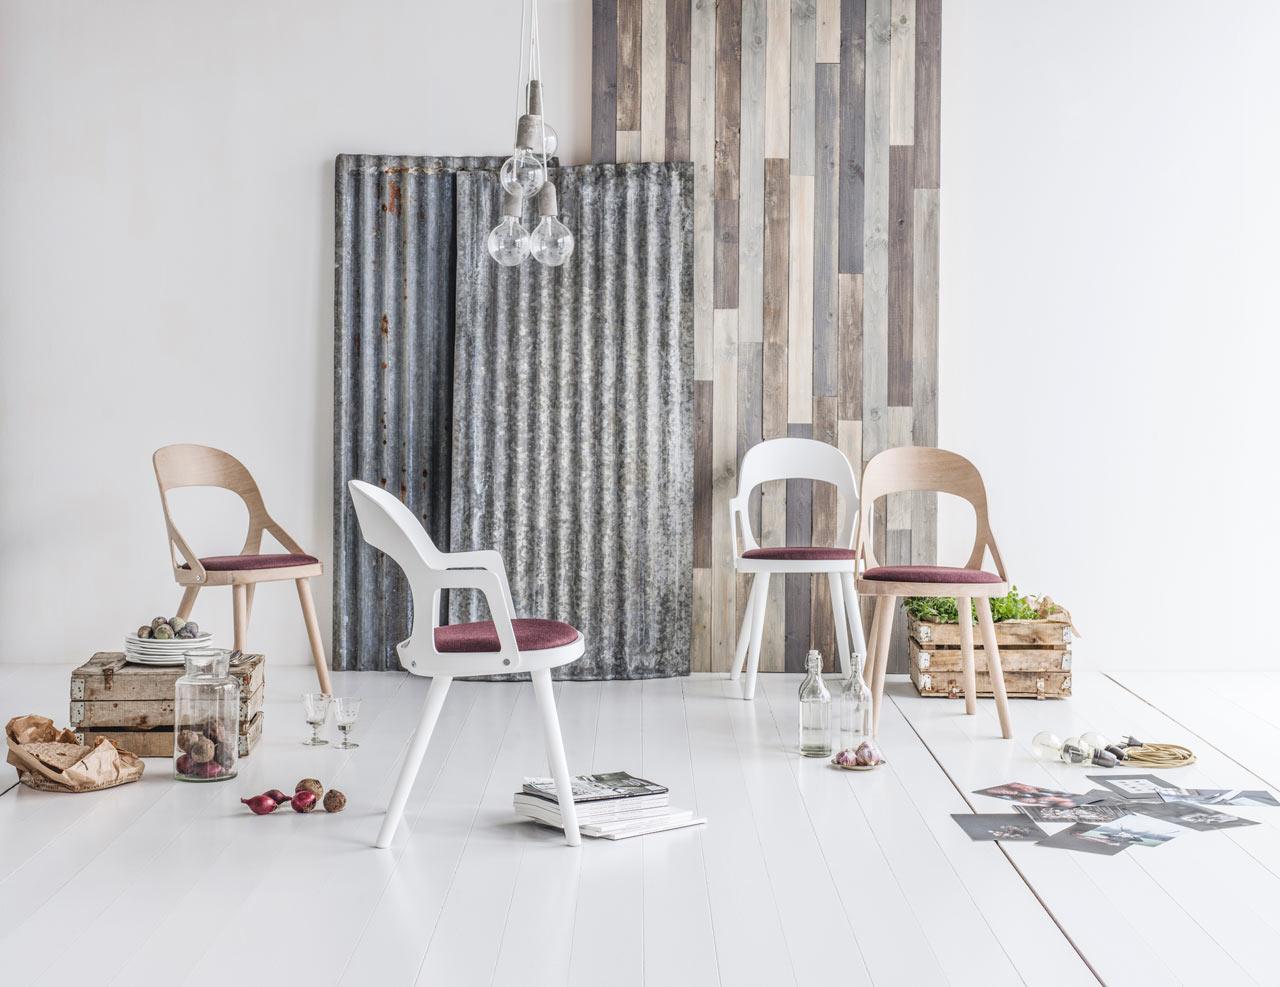 Colibri Chair by Markus Johansson for HansK